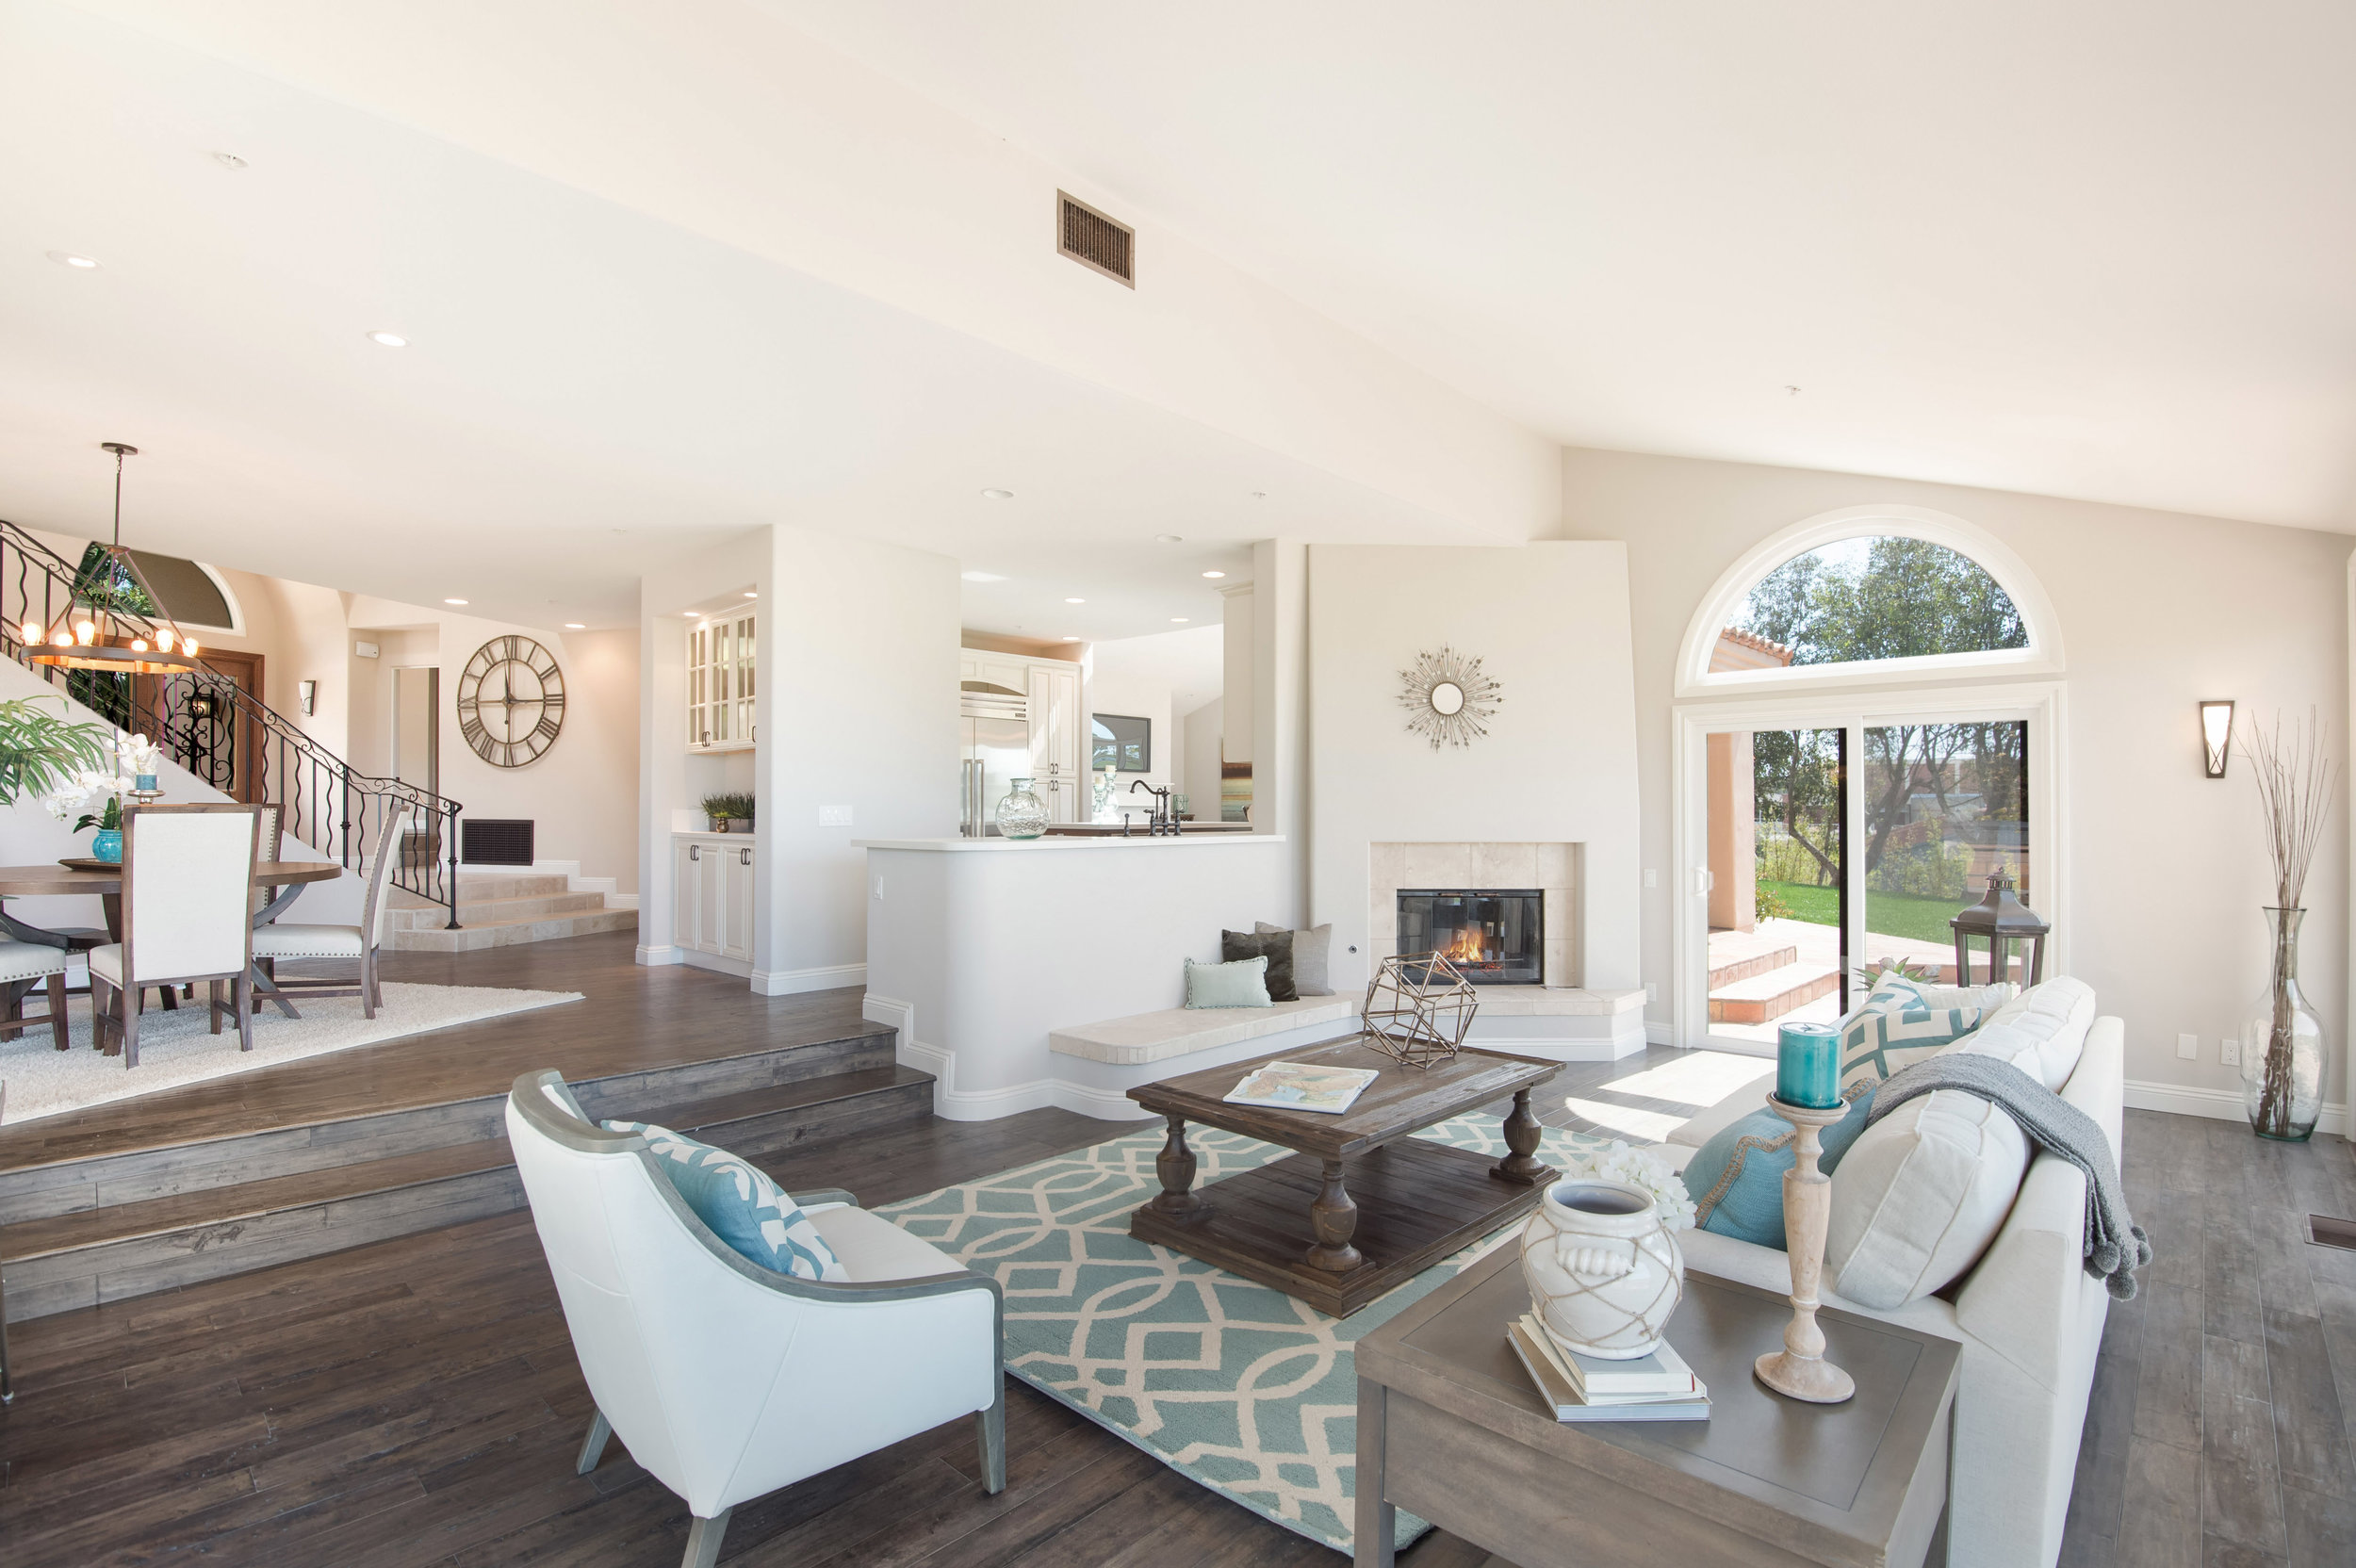 005 6130 Via Cabrillo For Sale Lease The Malibu Life Team Luxury Real Estate.jpg